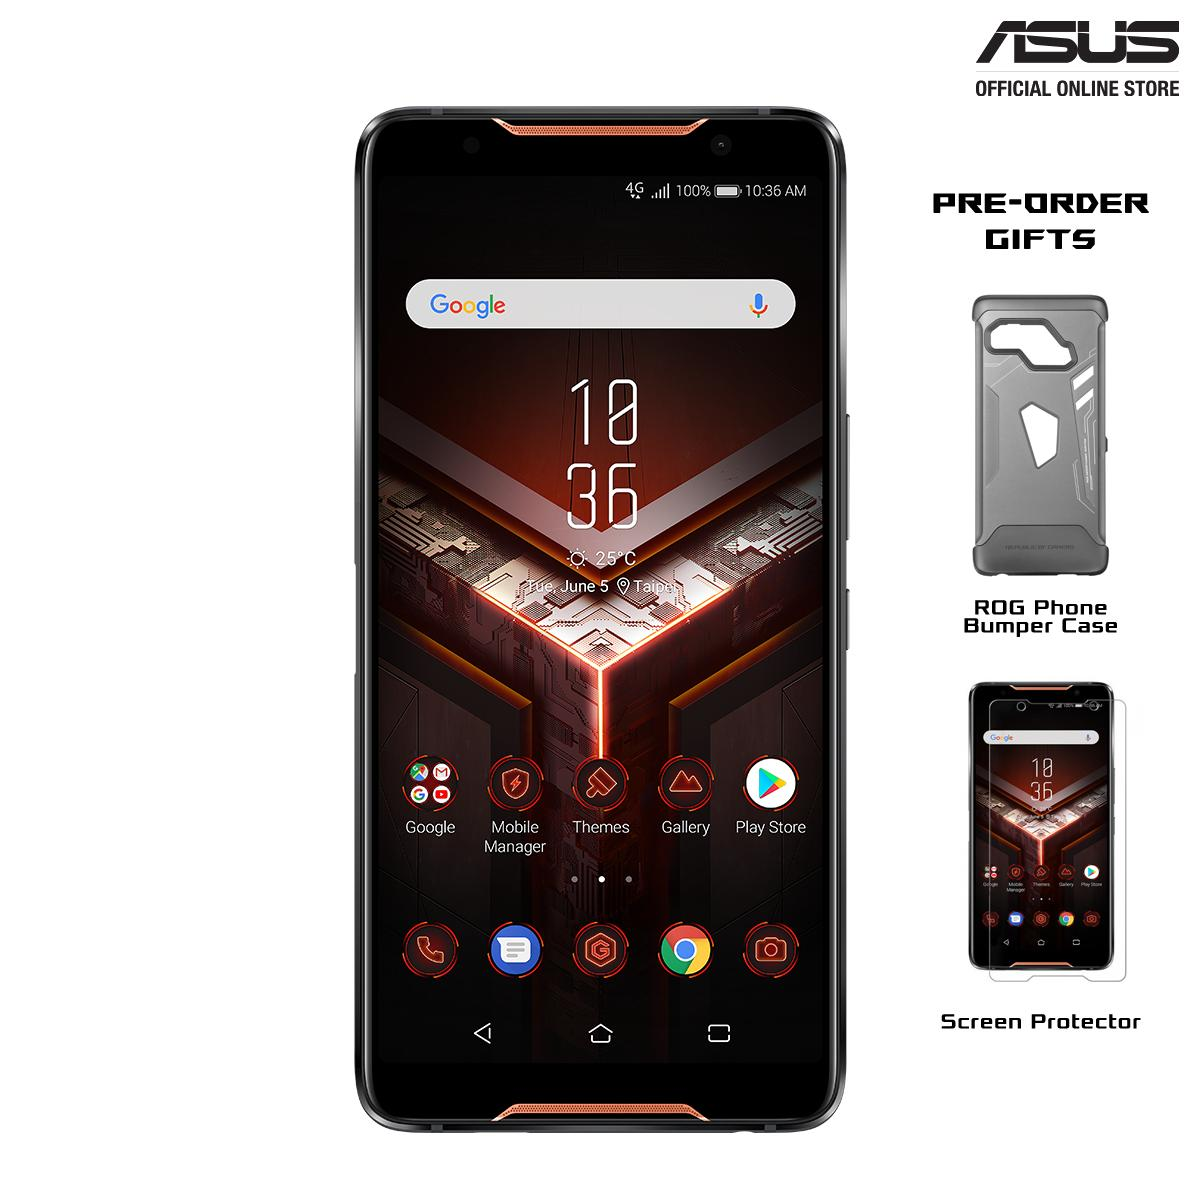 [Pre-Order] ROG Phone ZS600KL (512GB) [Delivery after 17 Nov]